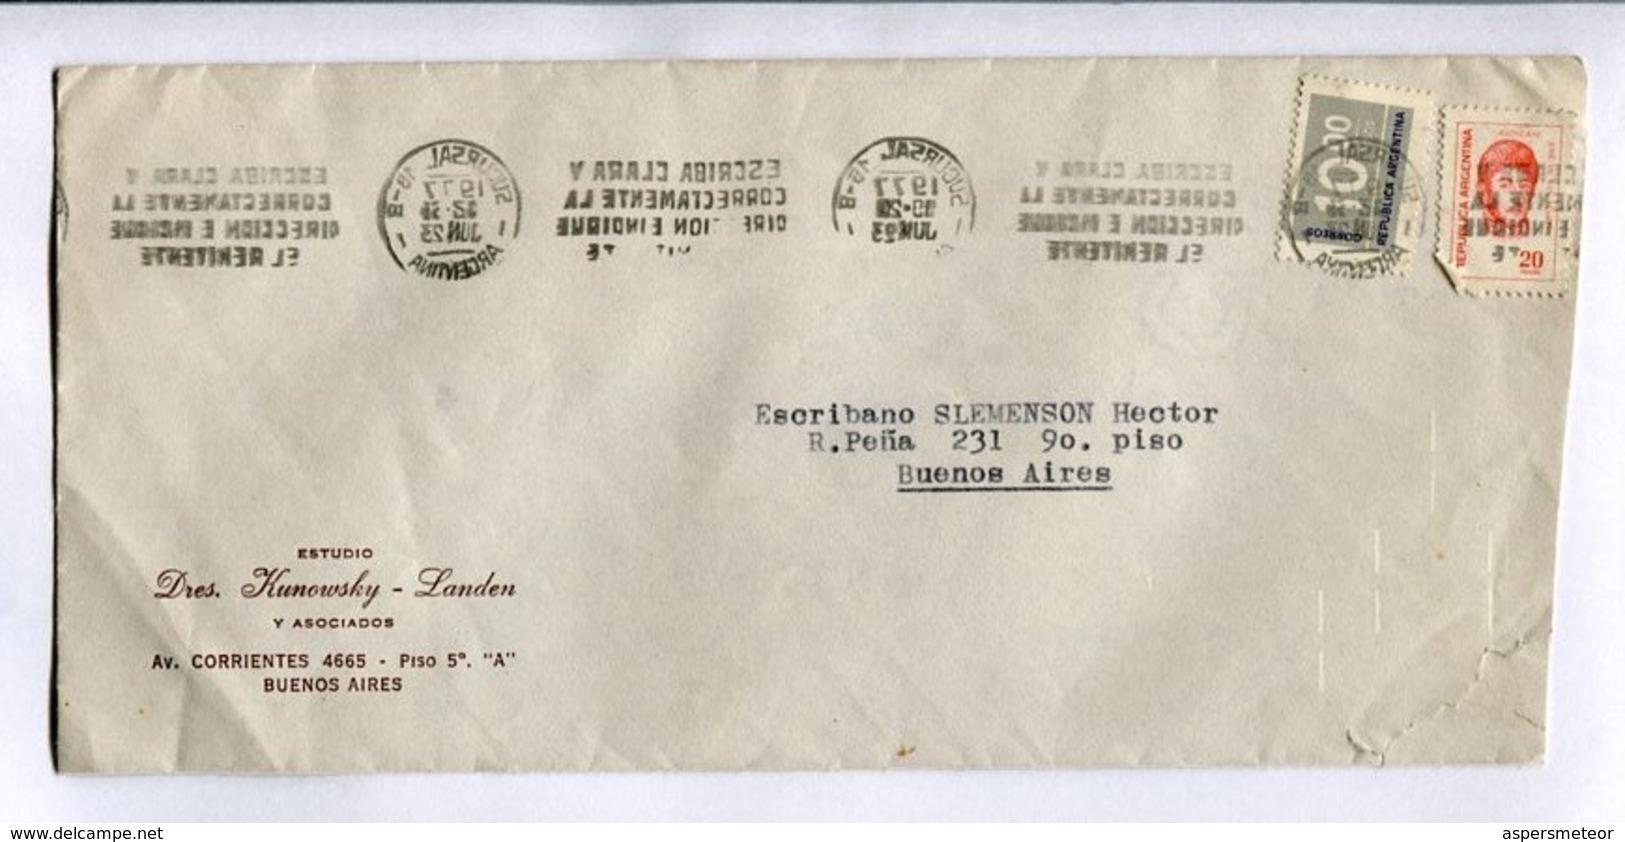 """ESTUDIO DRES KUNOWSKY - LANDEN"" ENVEOPE COMERCIAL CIRCULEE BUENOS AIRES ARGENTINE ANNEE 1977. BANDELETA PARLANTE -LILHU - Storia Postale"